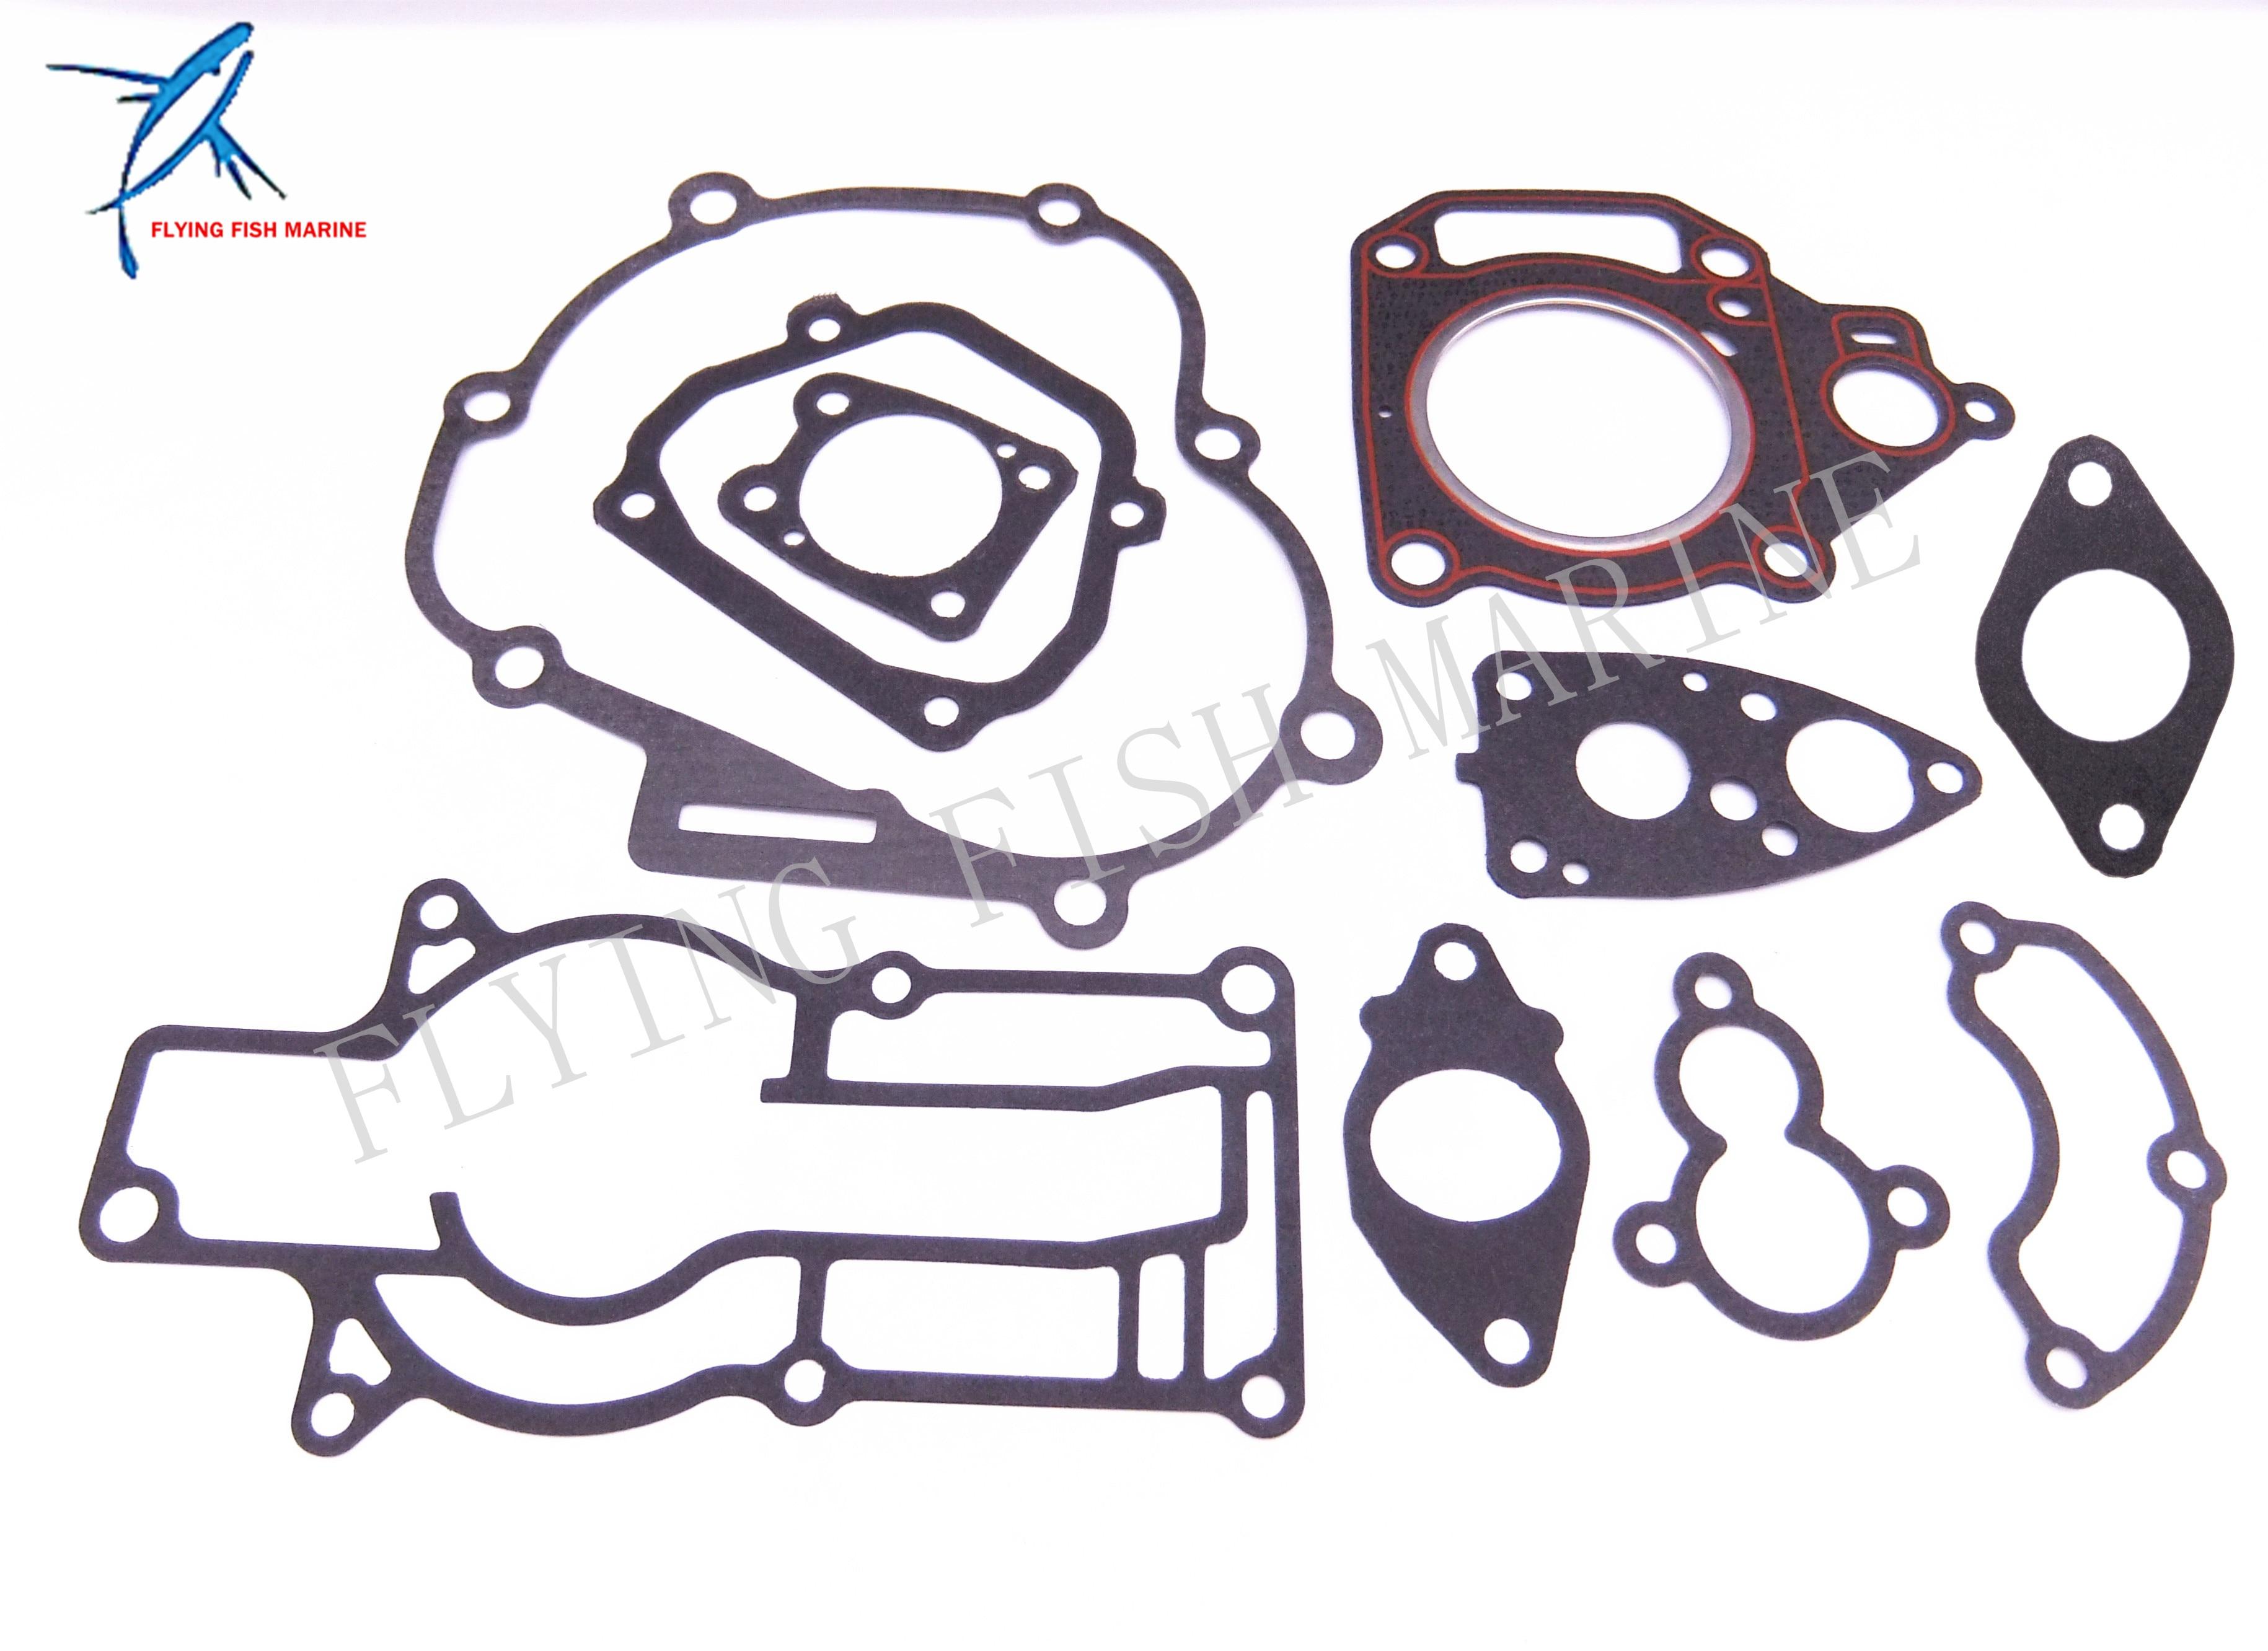 completa kit para yamaha f4 tempos 4hp motor de popa do barco